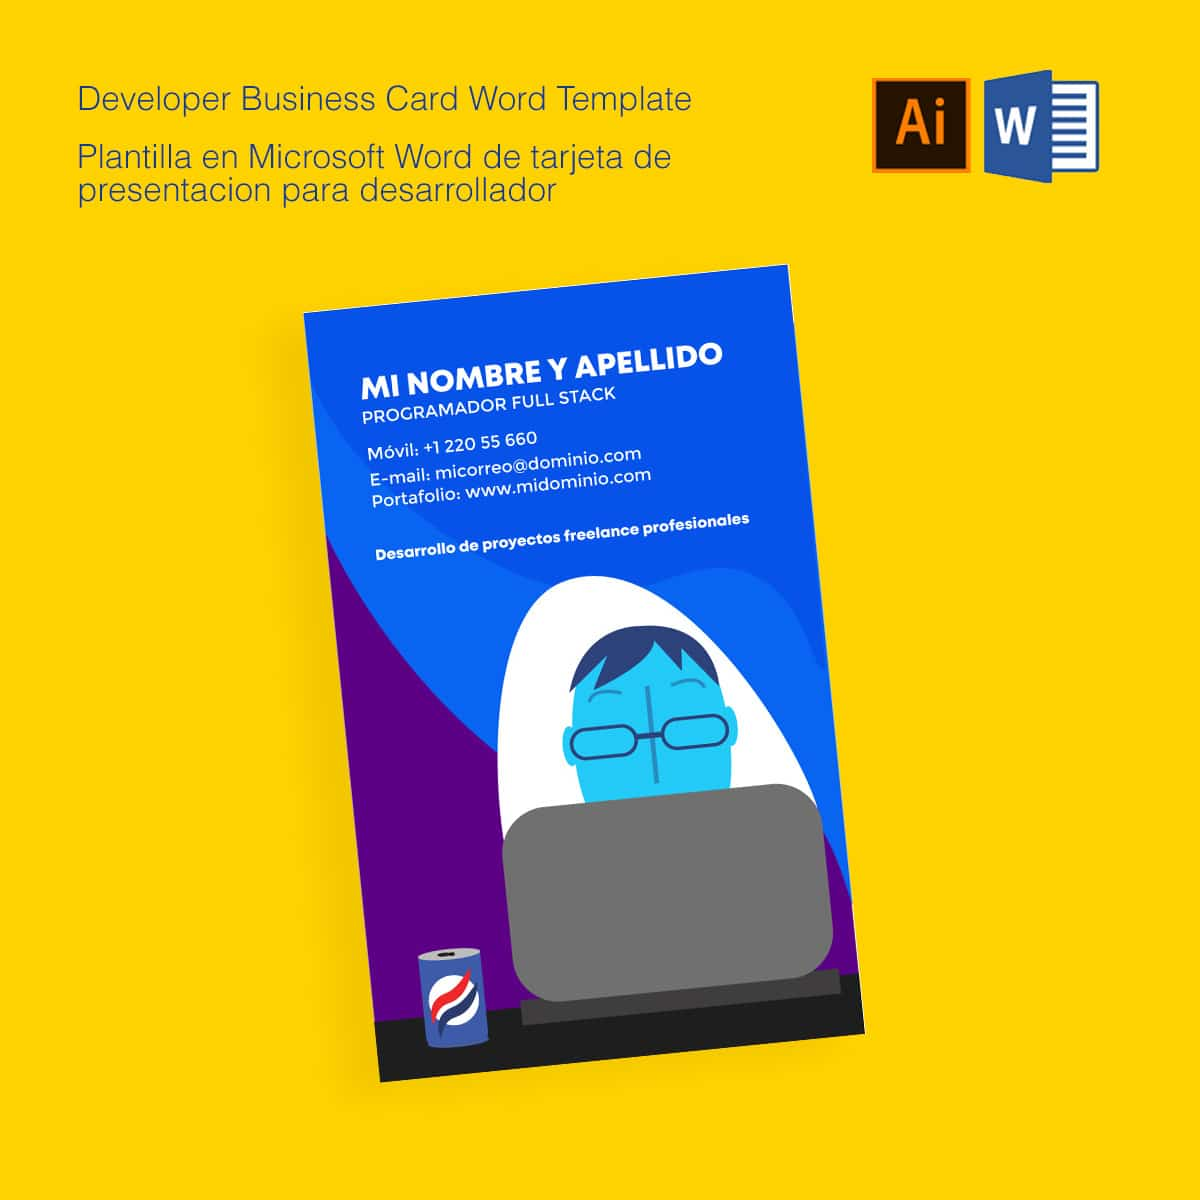 Descarga Plantilla editable Microsoft Word para Tarjeta de Presentación para informático | Download developer business card template Microsoft Word